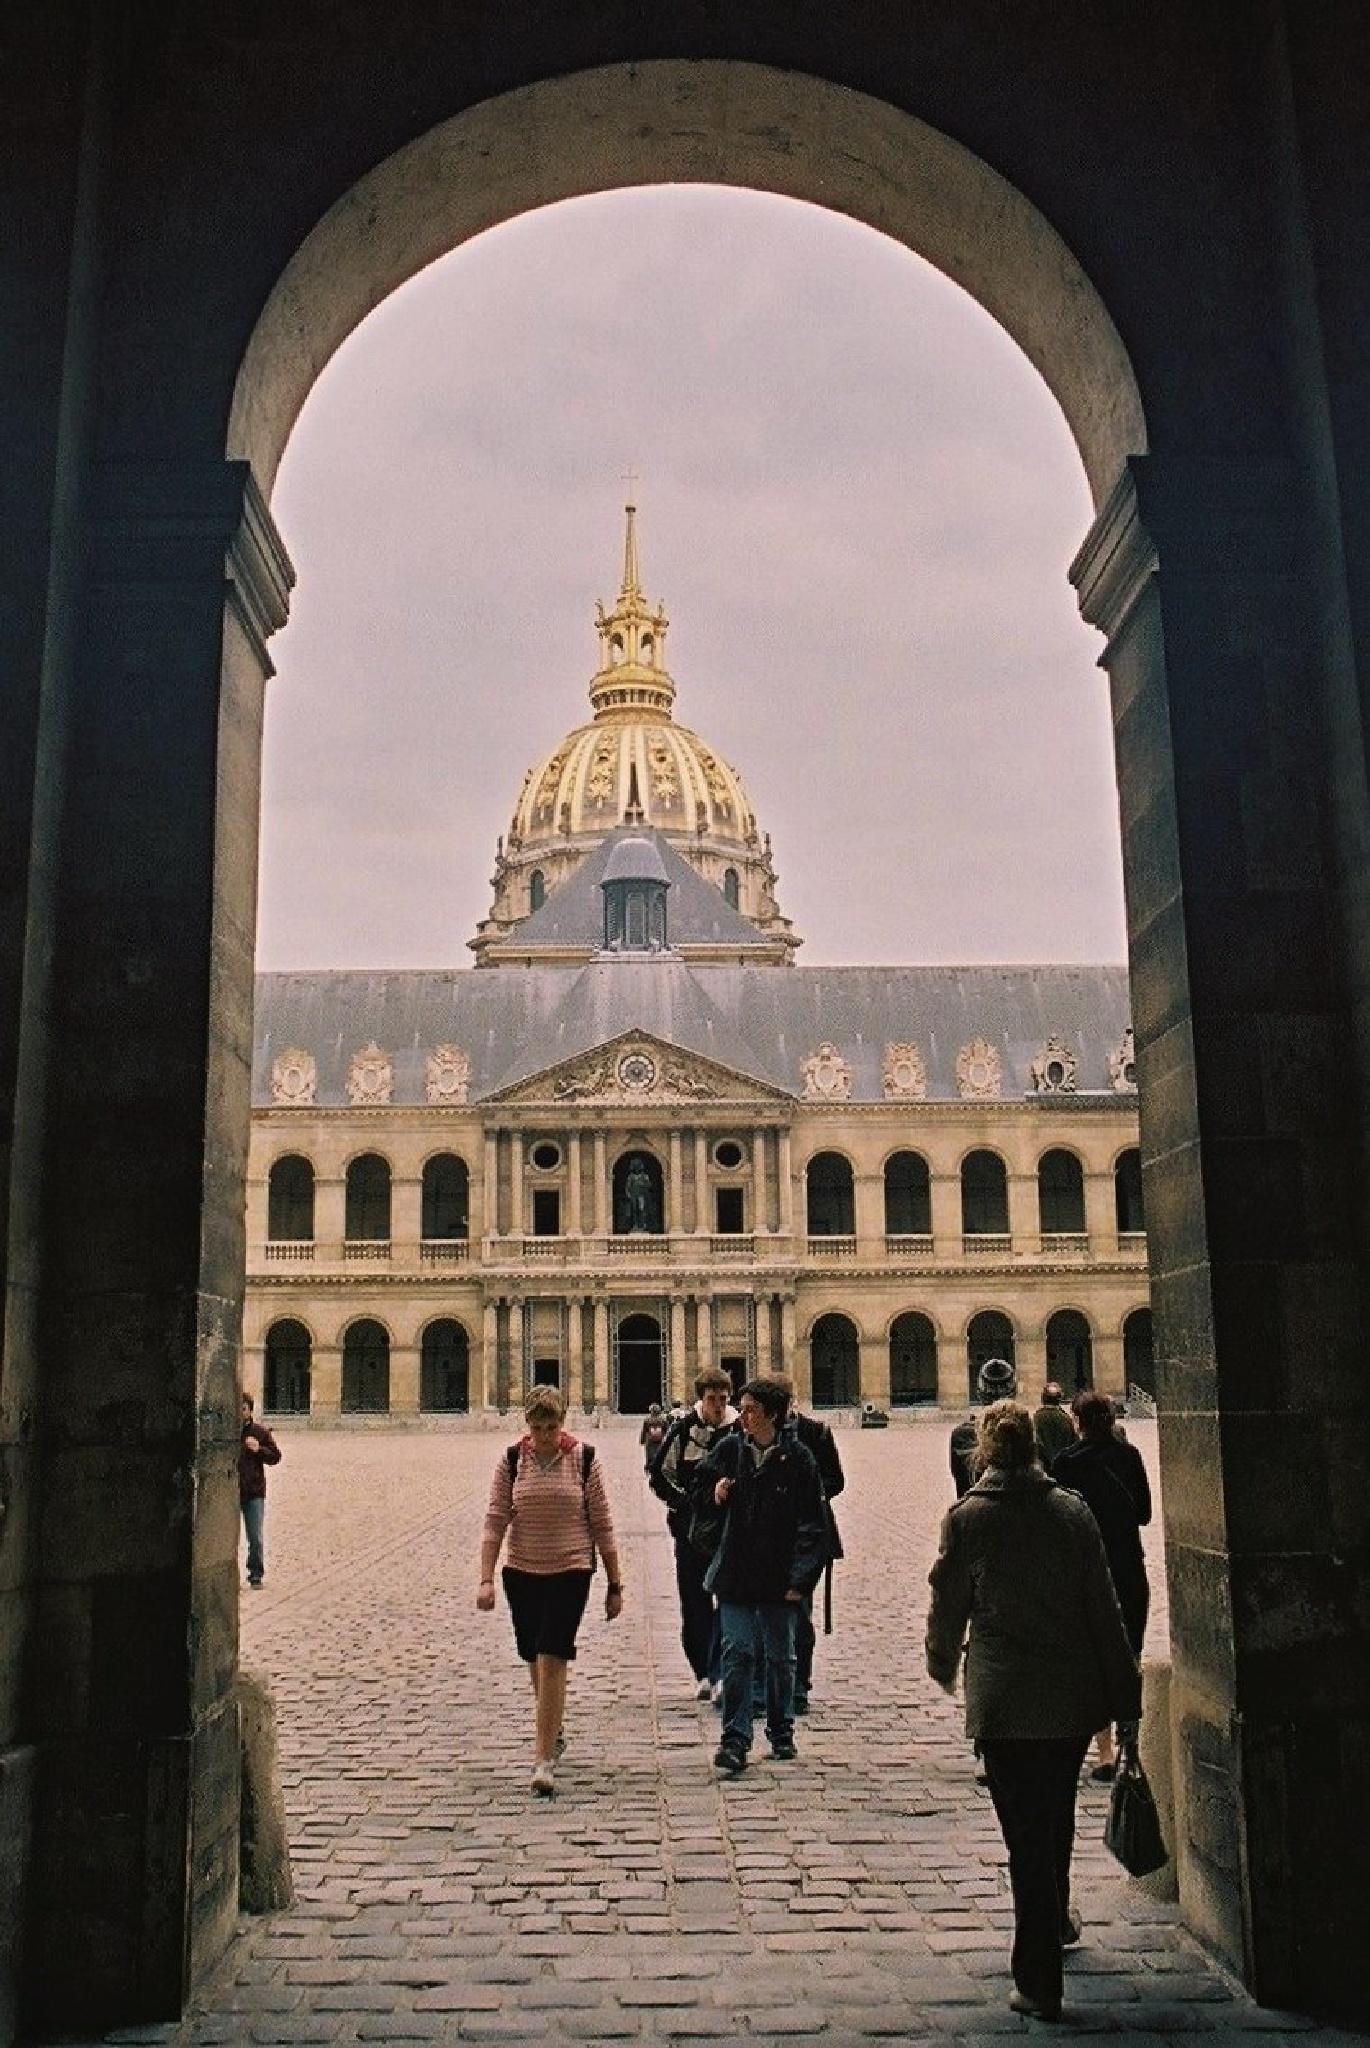 Les Invalides by colin.savidge